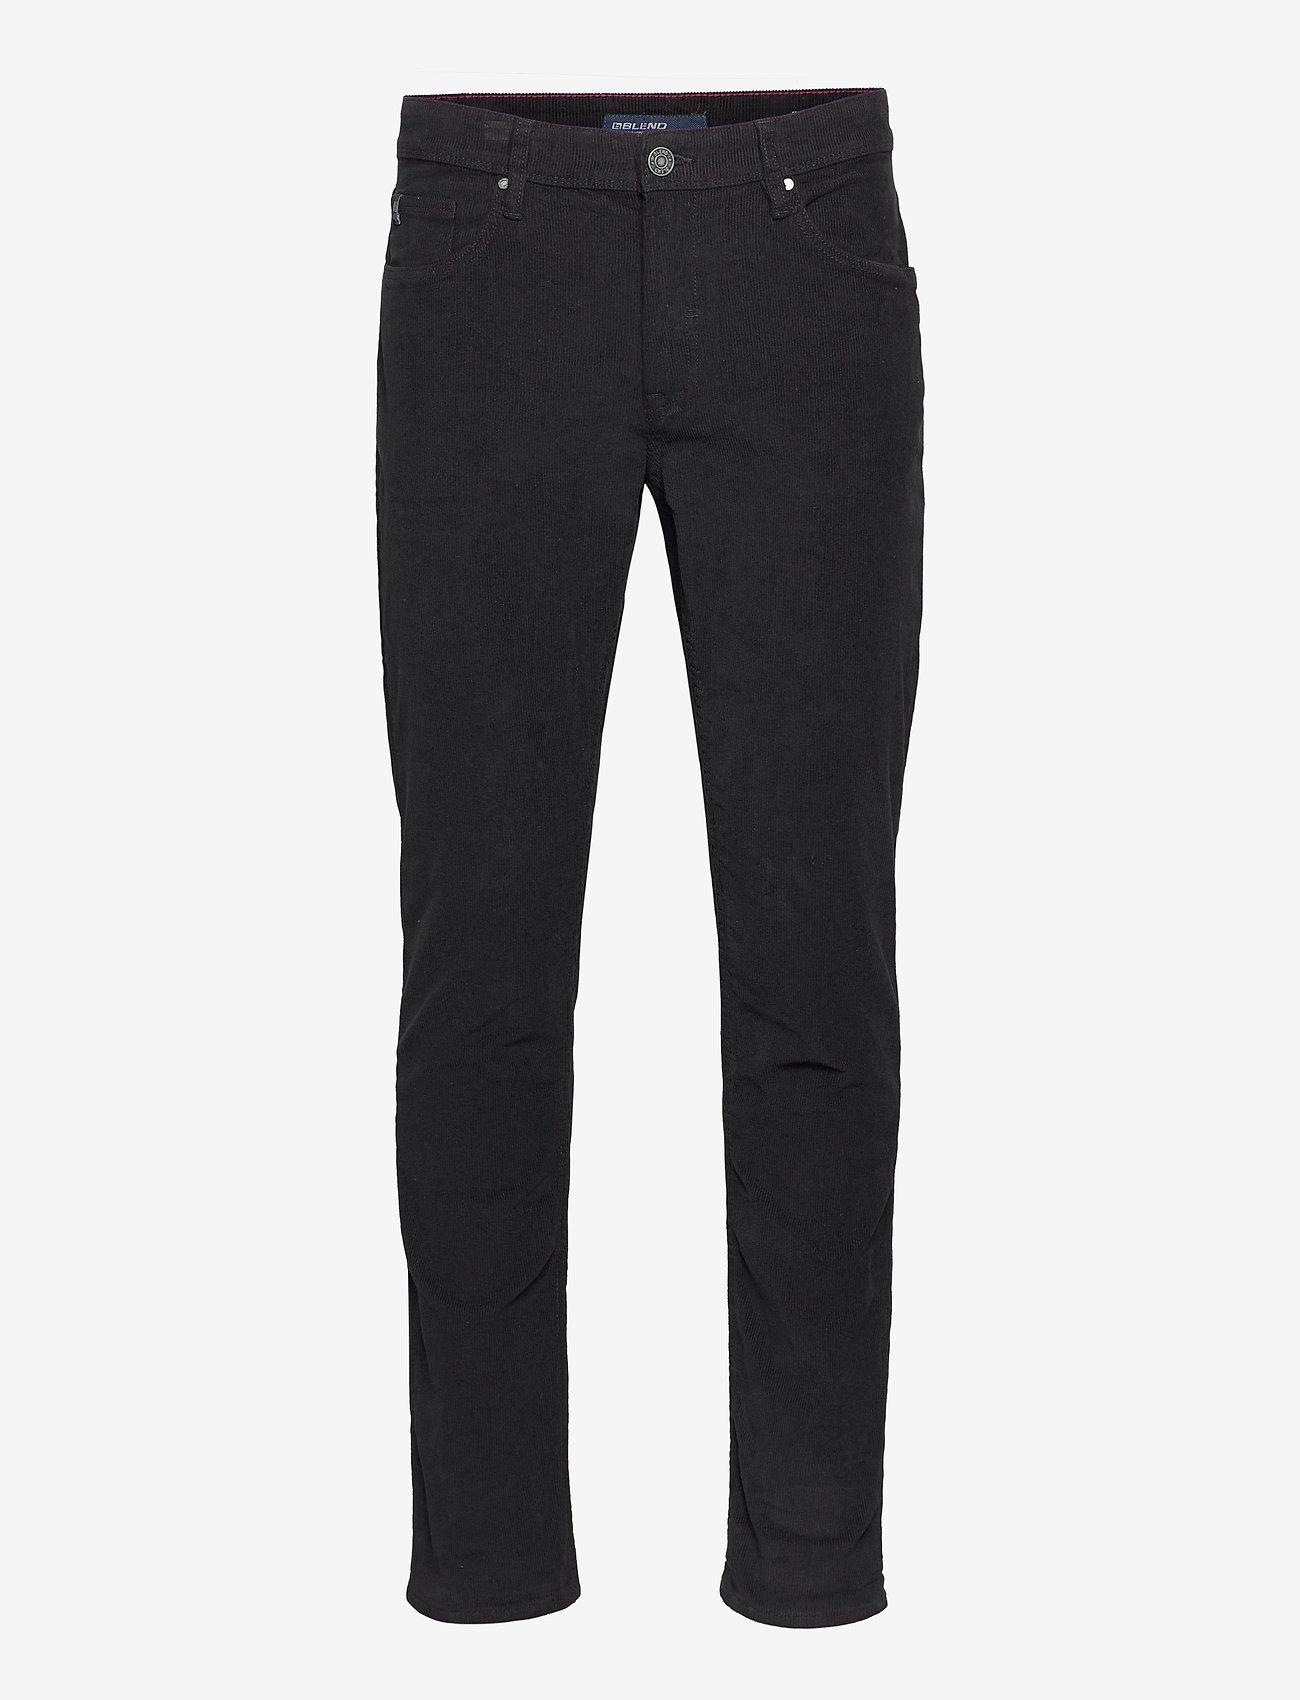 Blend - Pants - slim jeans - black - 1